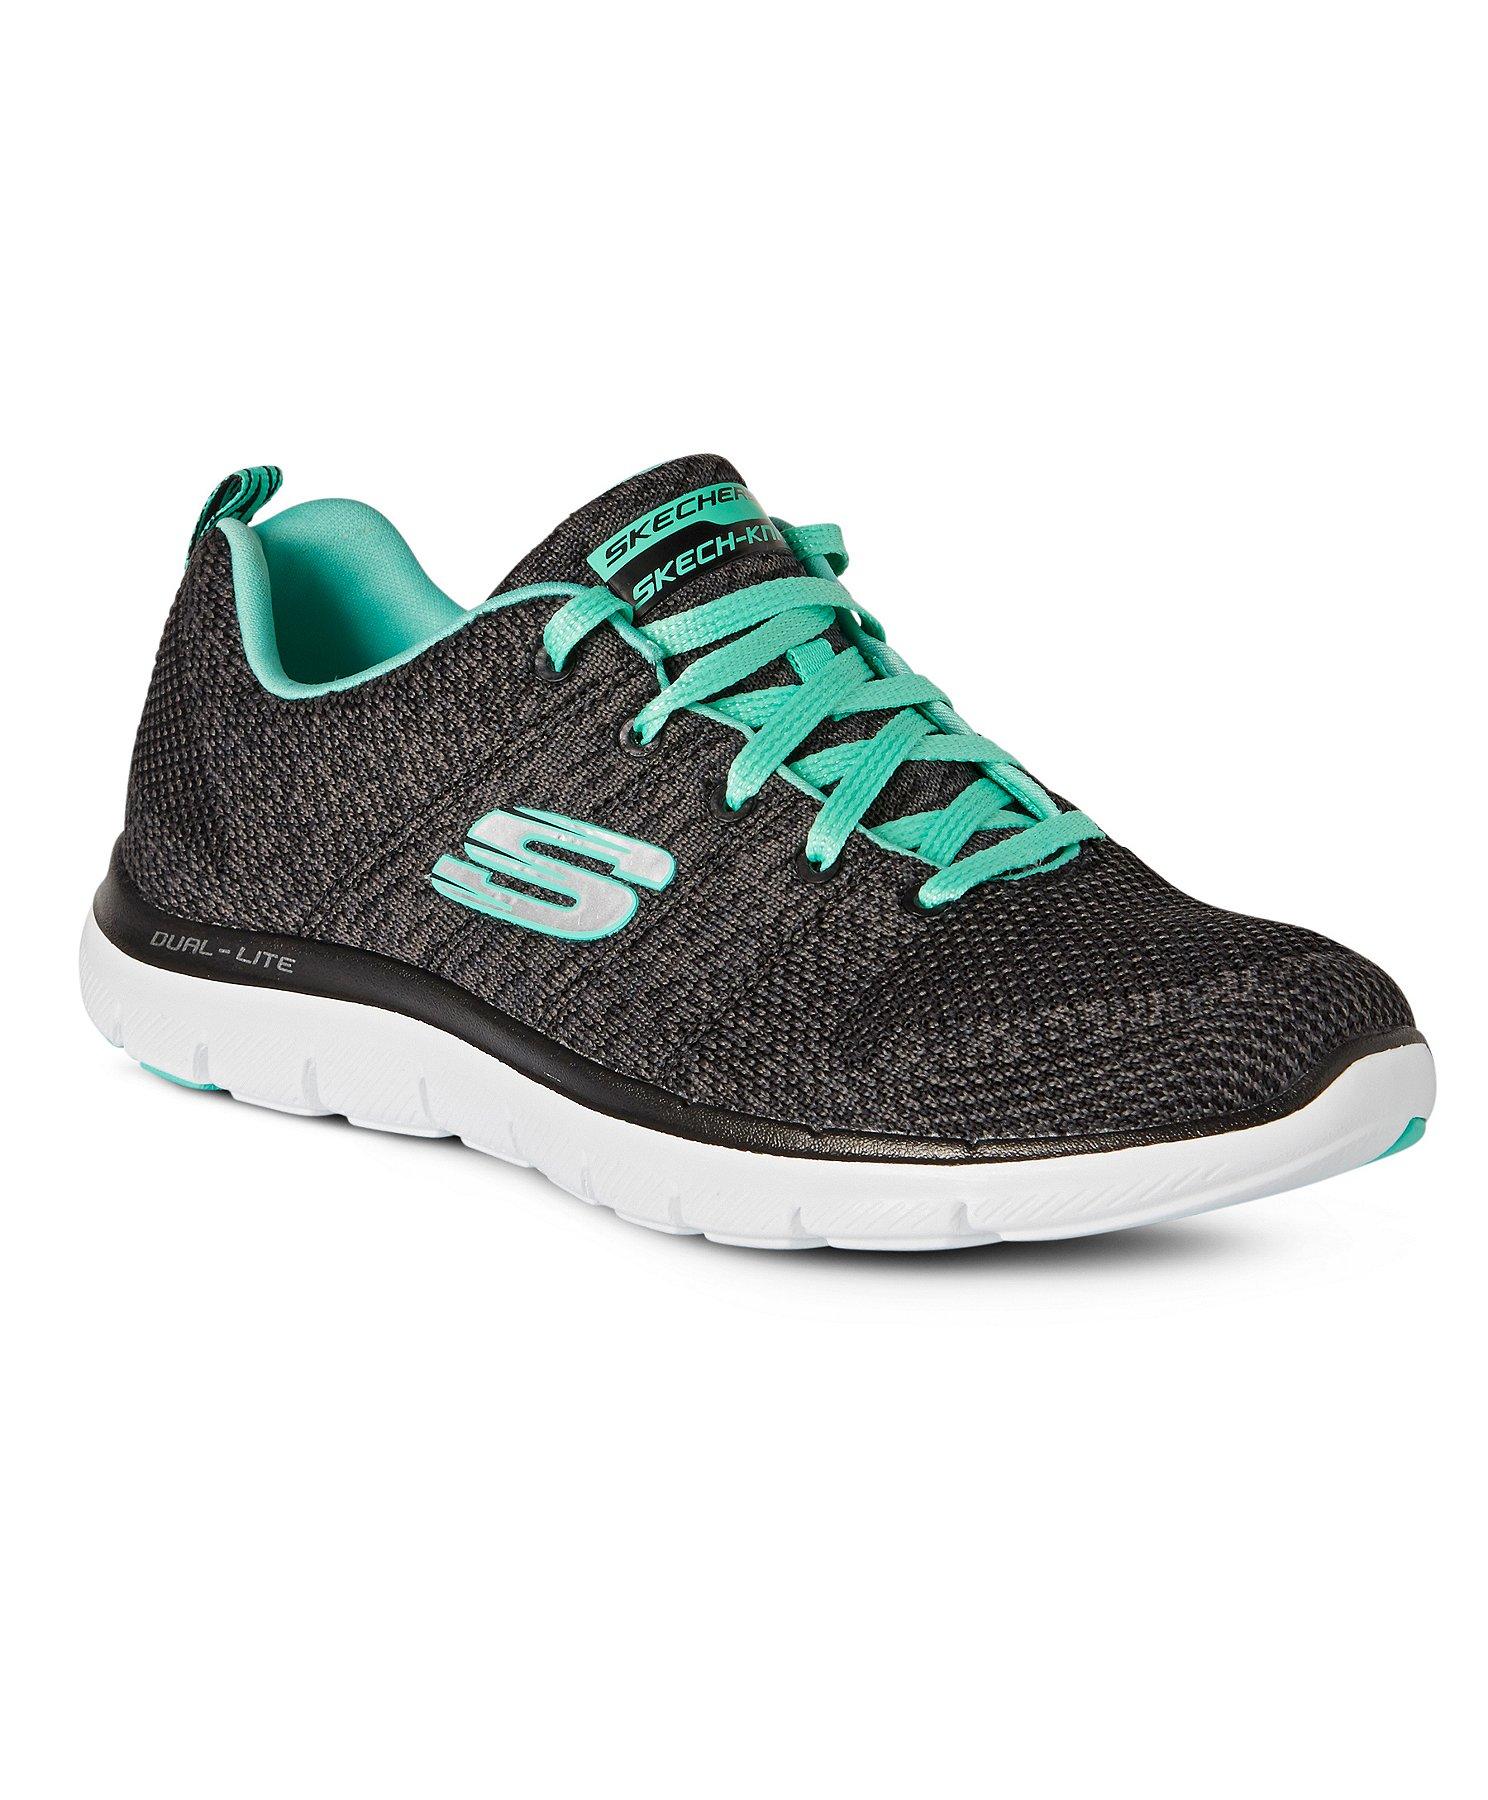 7f1db0e3a1113 Women's Flex Appeal 2.0 High Energy Sneakers